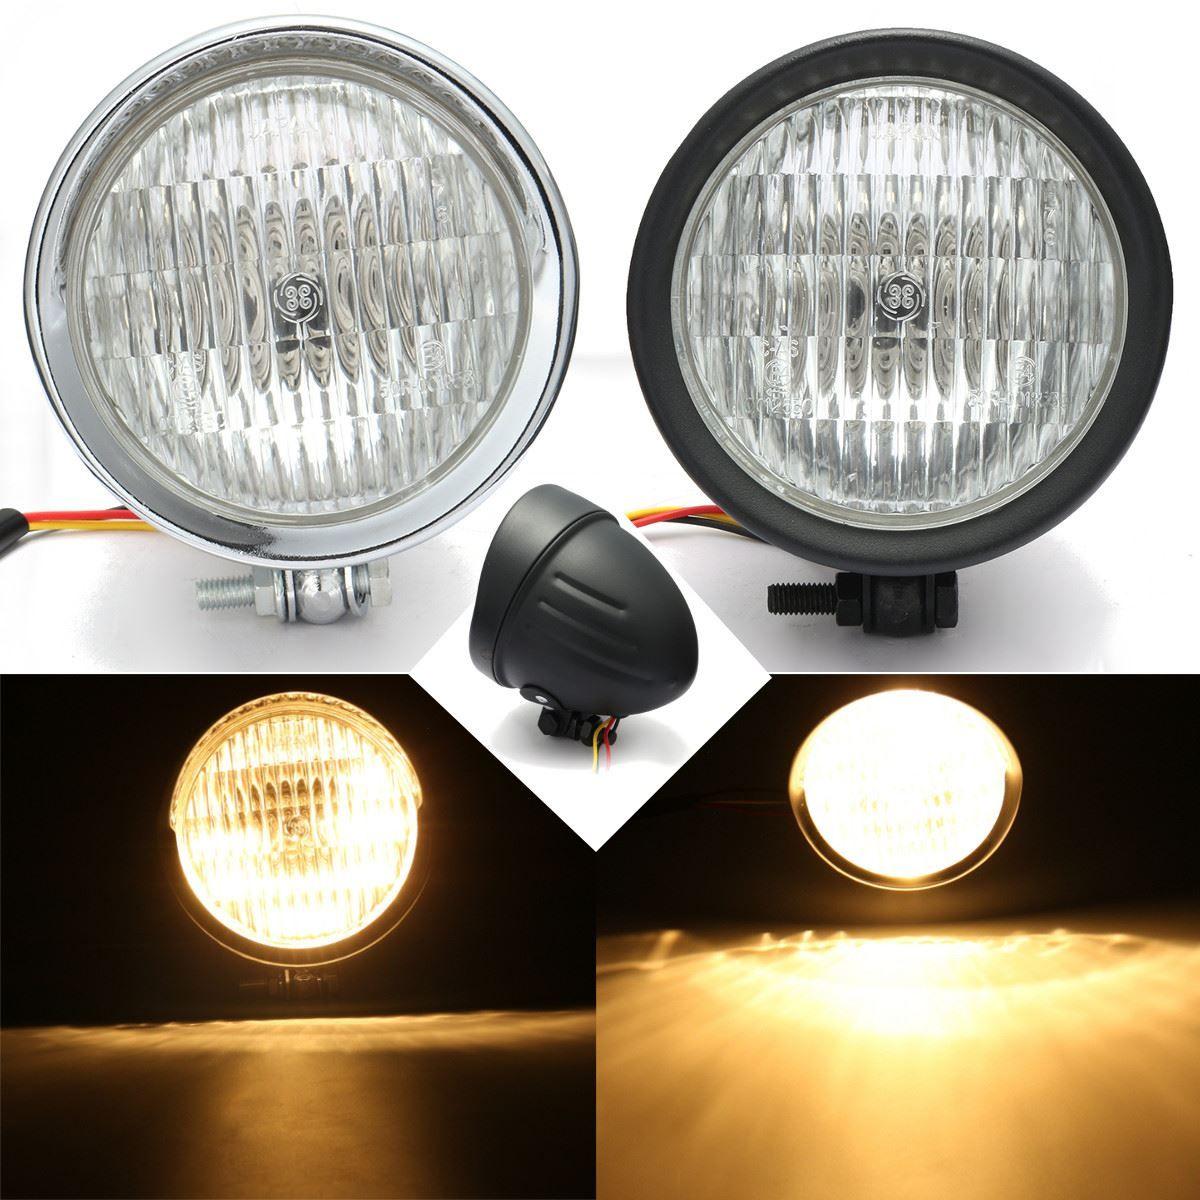 Chrome Black Motorcycle Headlight Head Light Lamp Hi/Lo For Harley /Bobber /Chopper /Touring